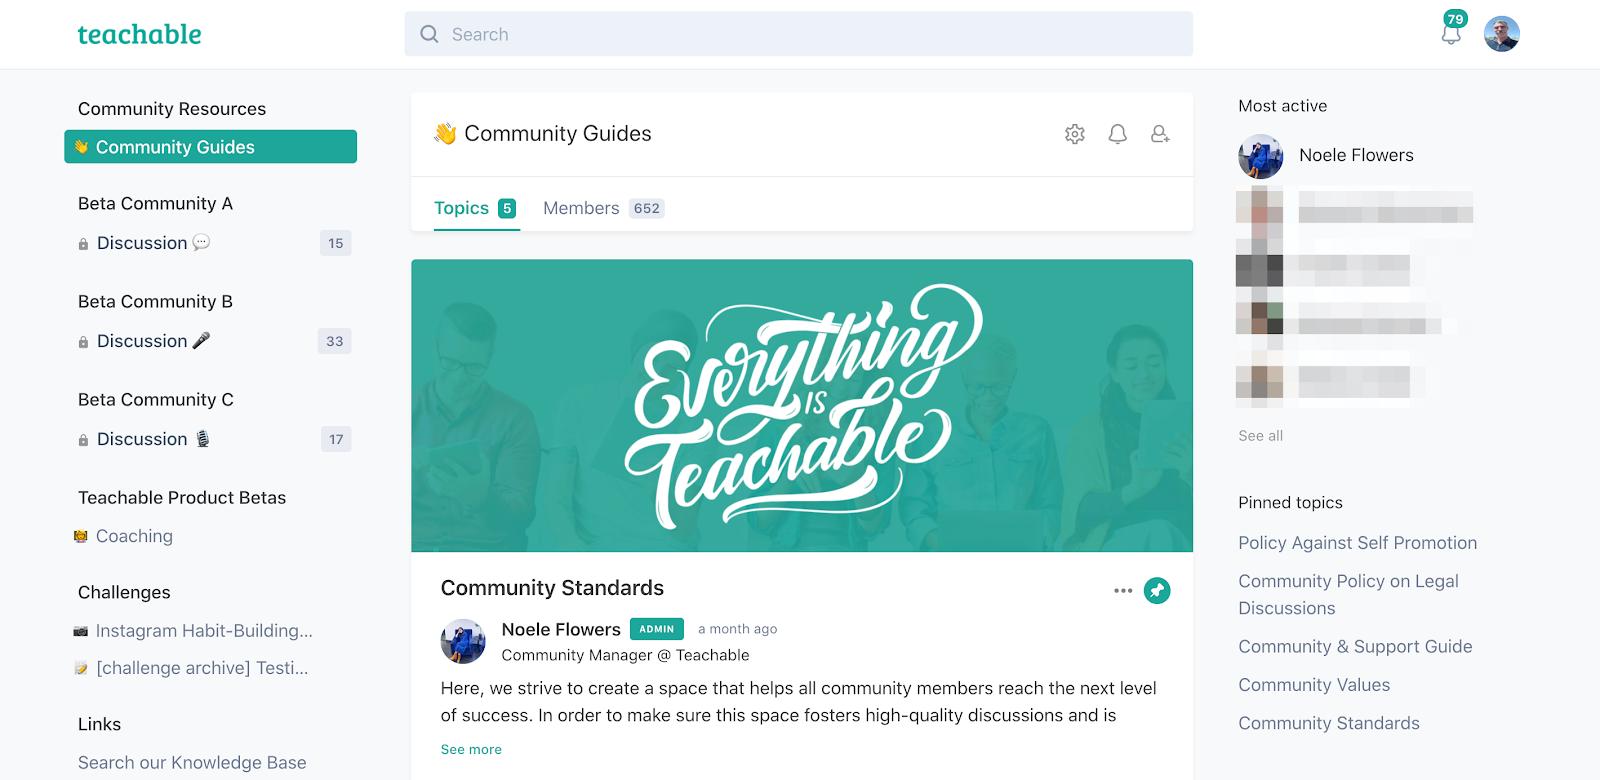 teach:ableのクリエイター向けコミュニティ参考: